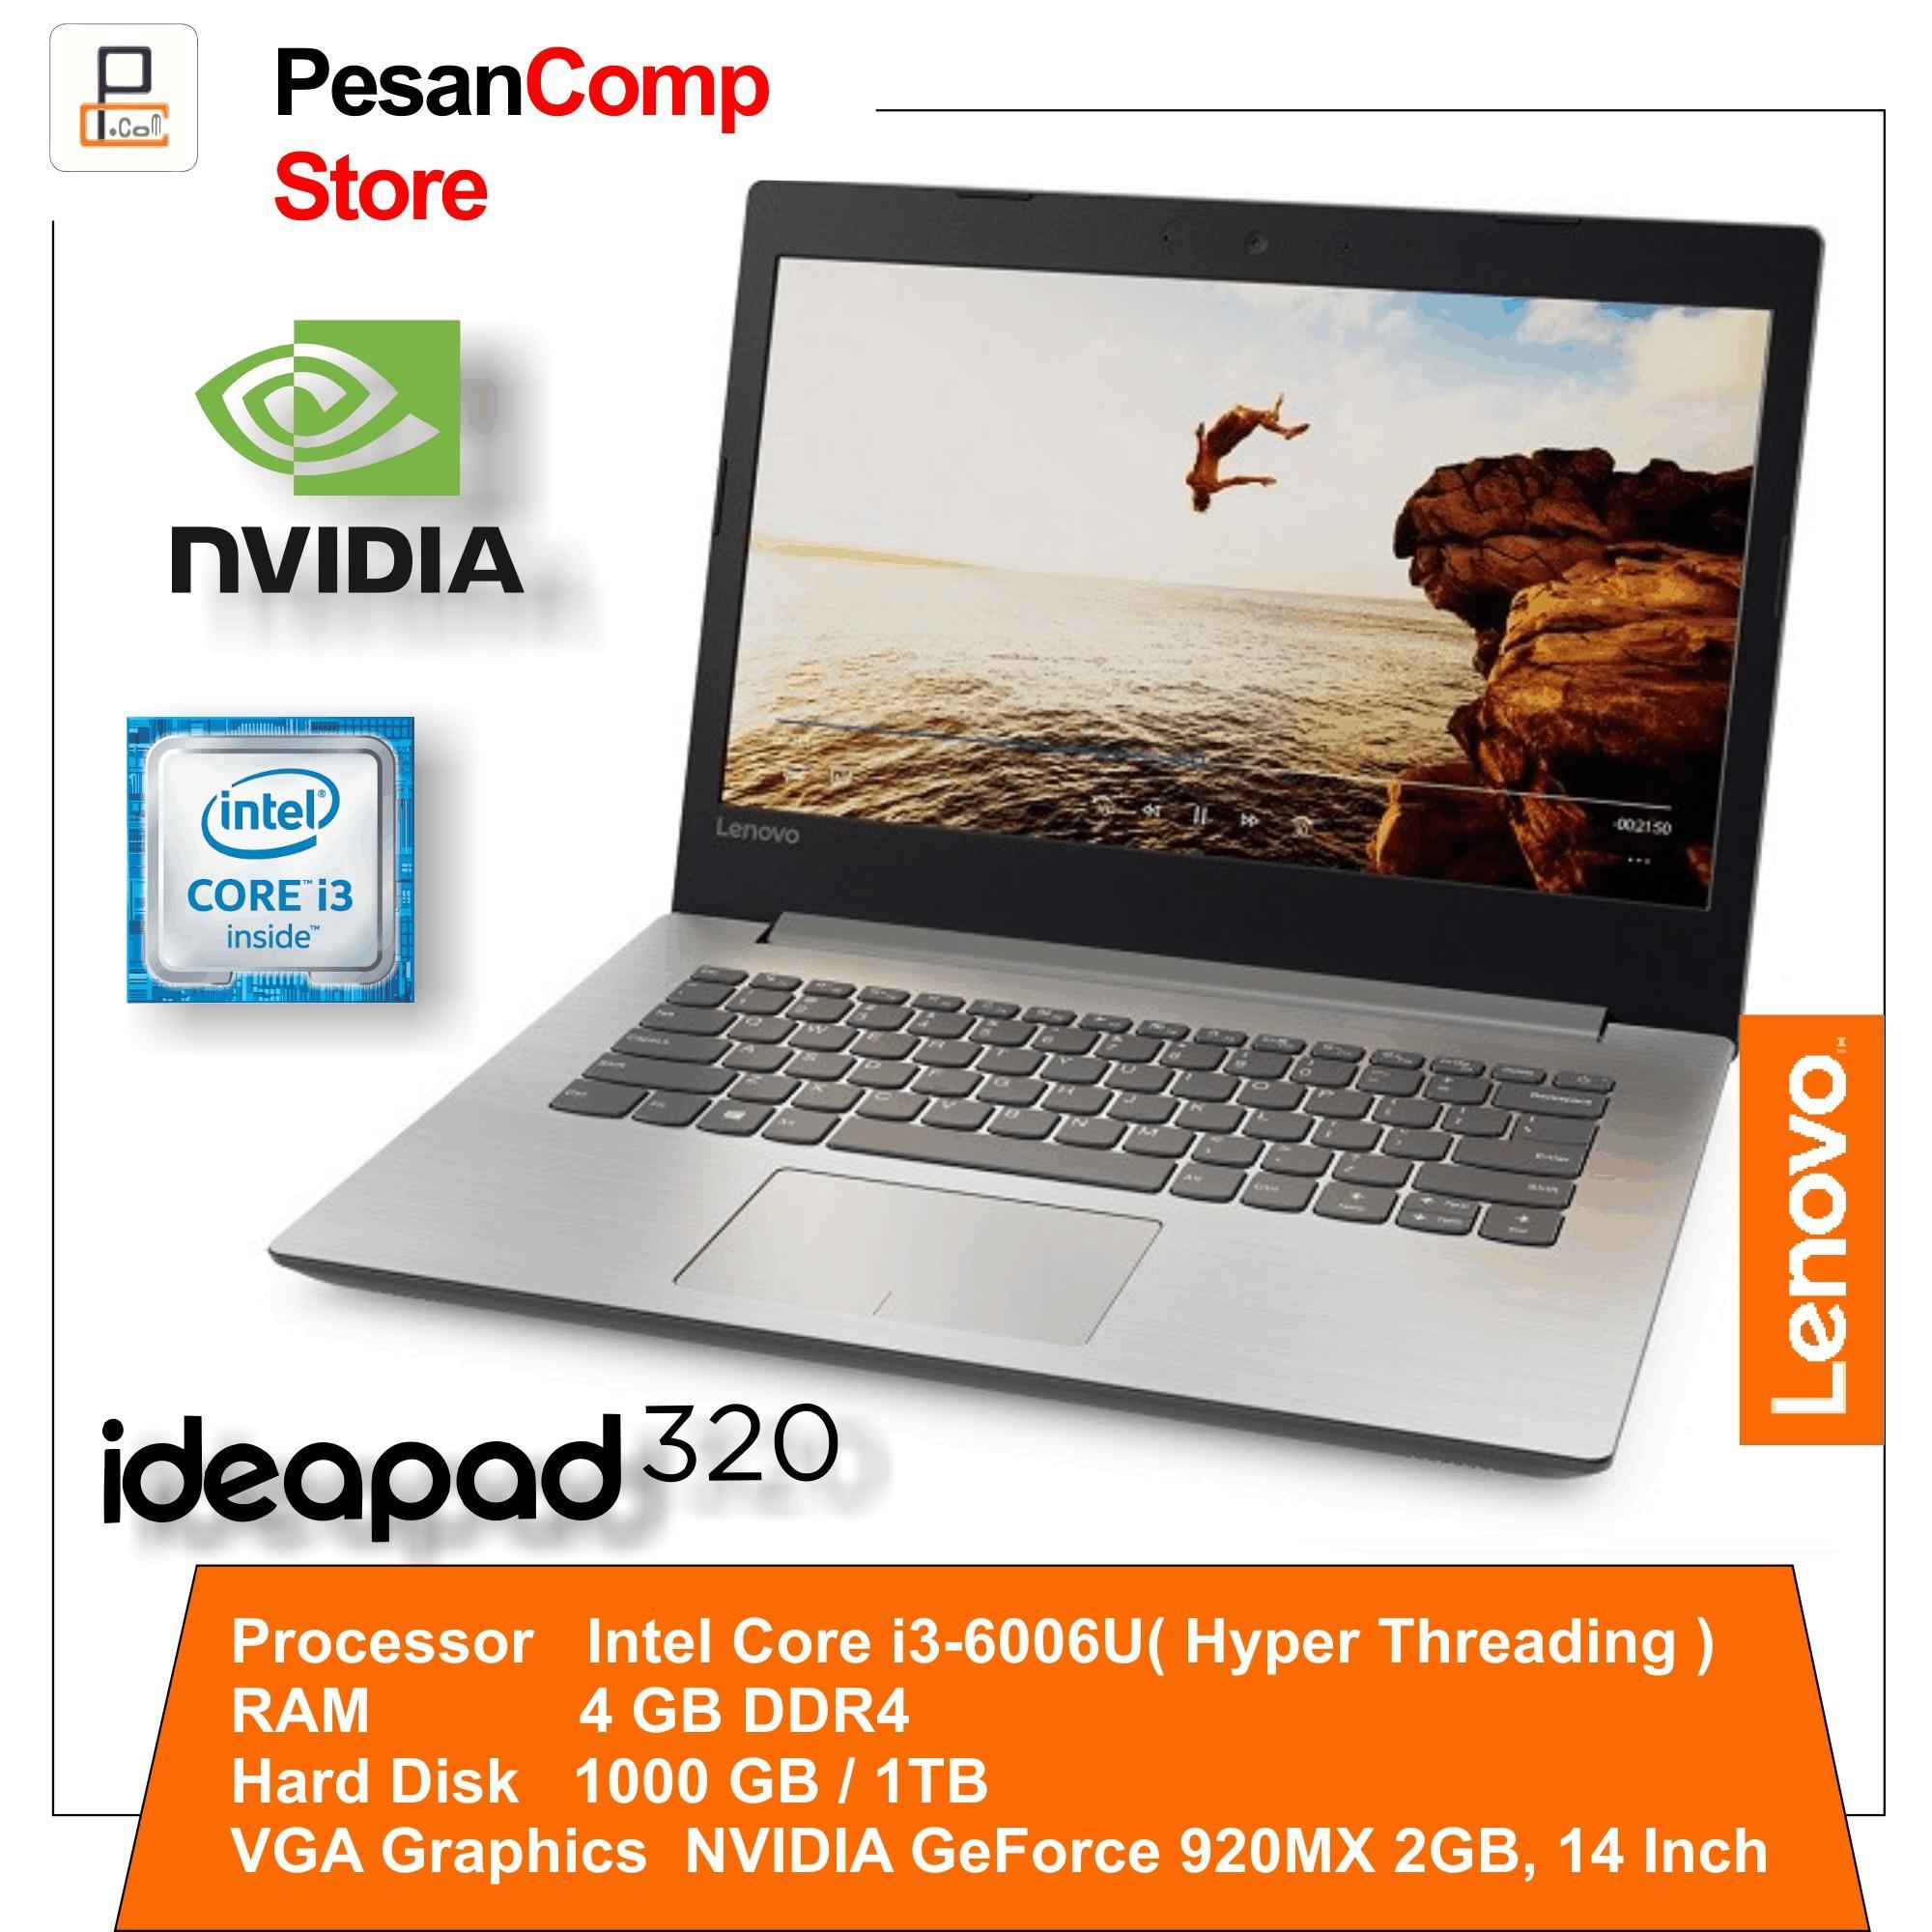 Lenovo IdeaPad 320-14ISK Intel i3-6006U / NVidia GeForce 920MX 2GB / 4GB DDR4 / 1 TB / DOS / 14 Inch / Slim Desain / Garansi Resmi Lenovo Indonesia